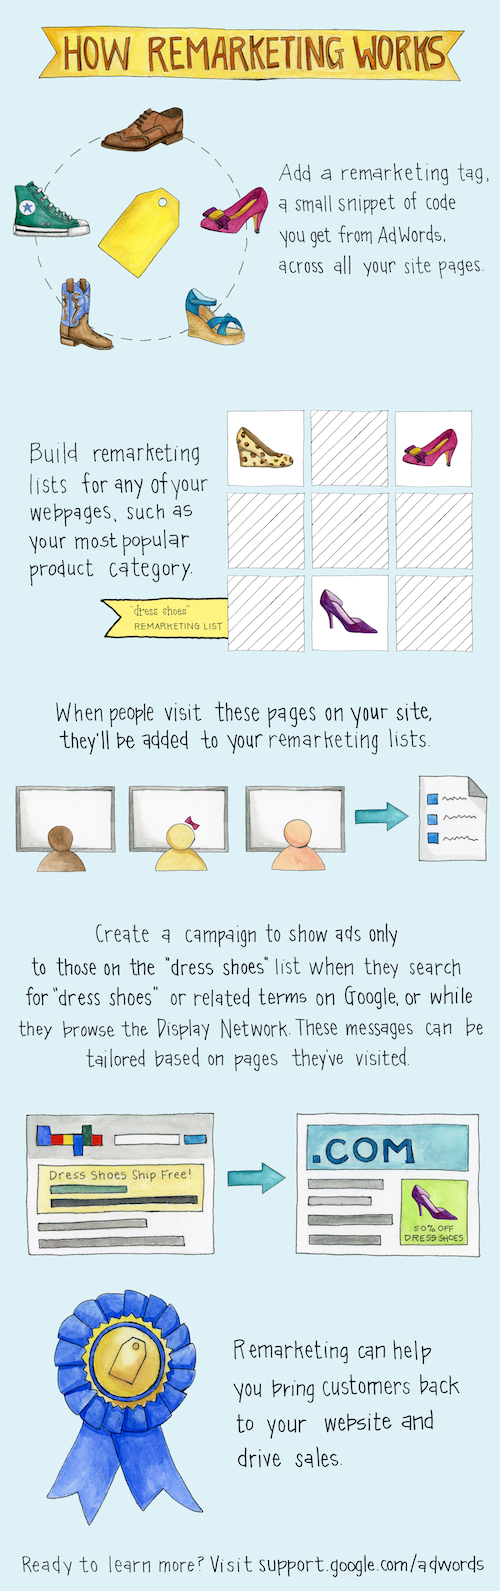 Google Remarketing Infographic